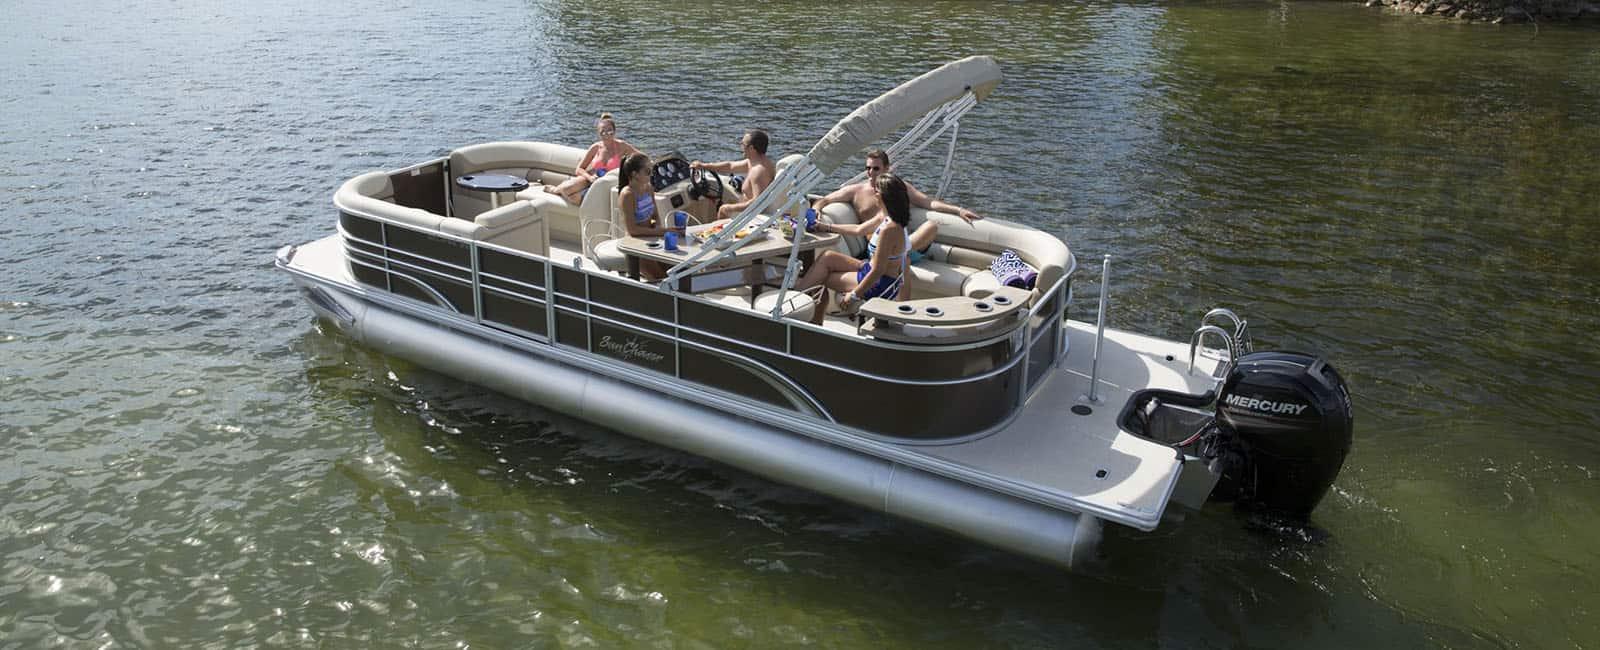 SunChaser Eclipse 8523 LR DH – pontoon boat